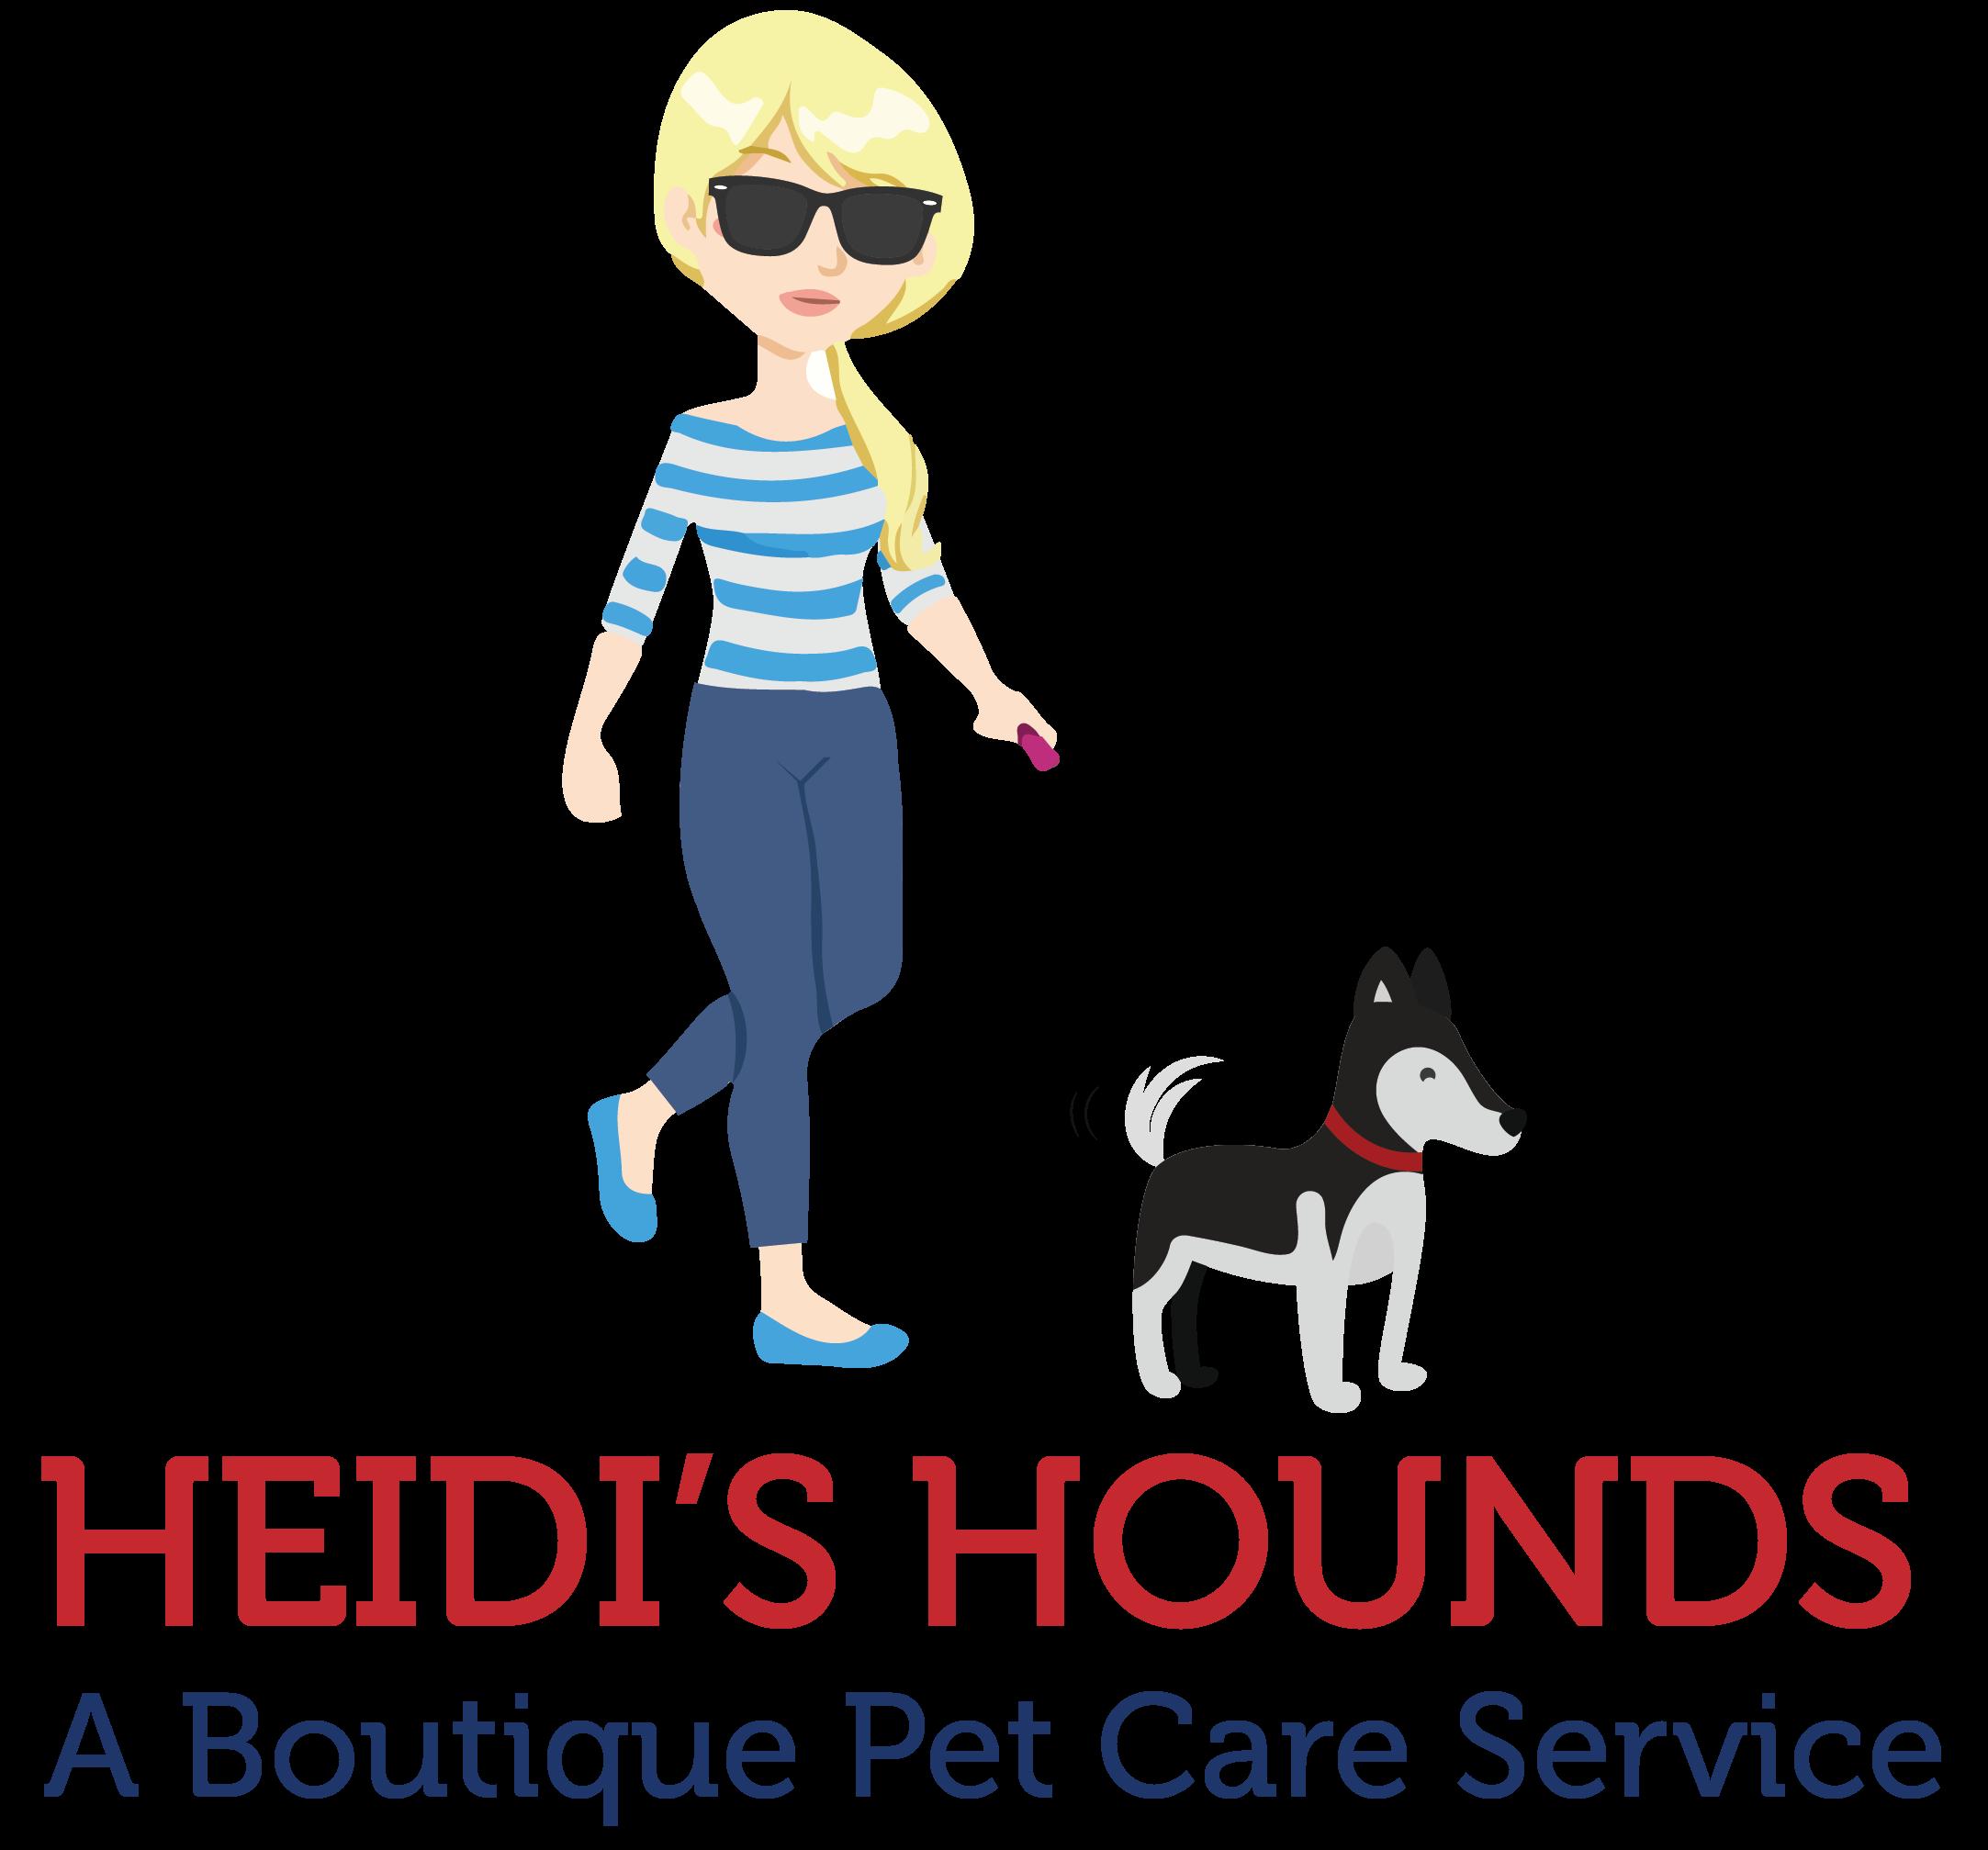 Heidi's Hounds